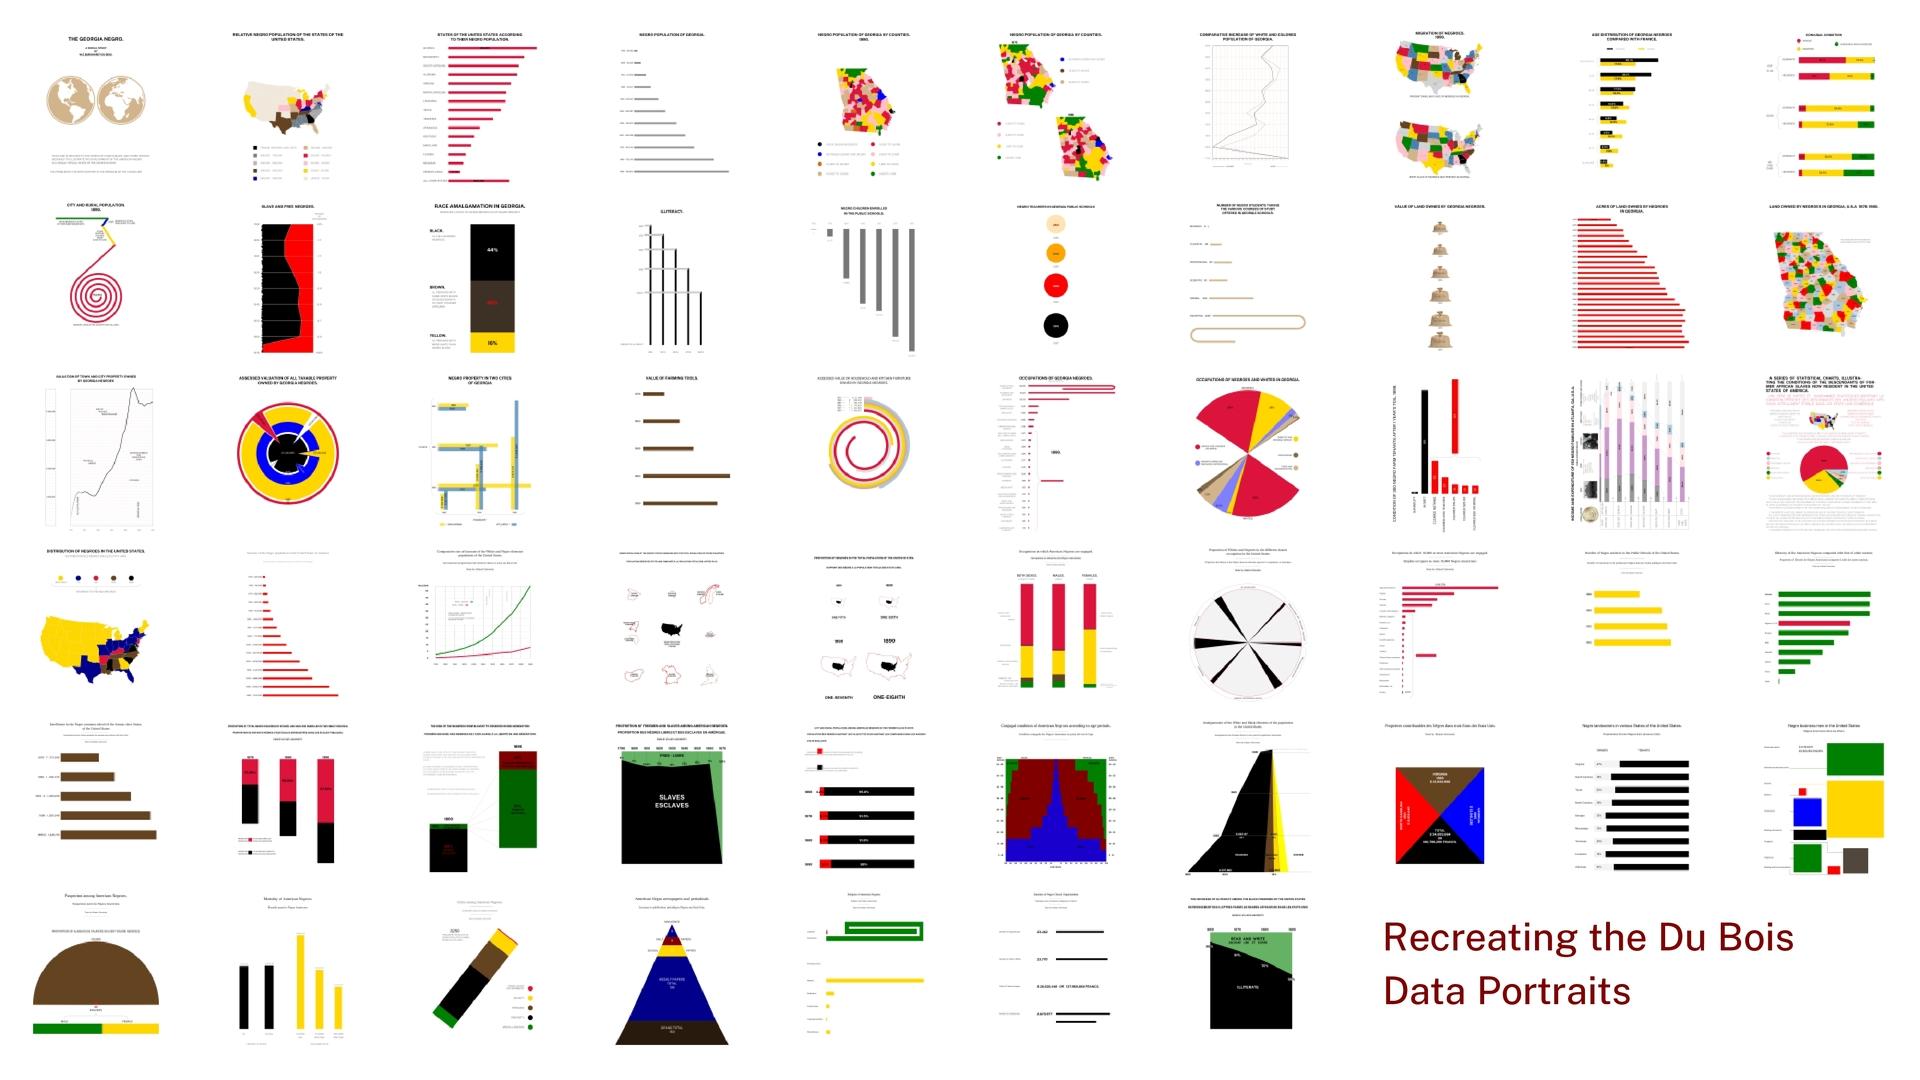 Recreating the DuBois Data Portraits